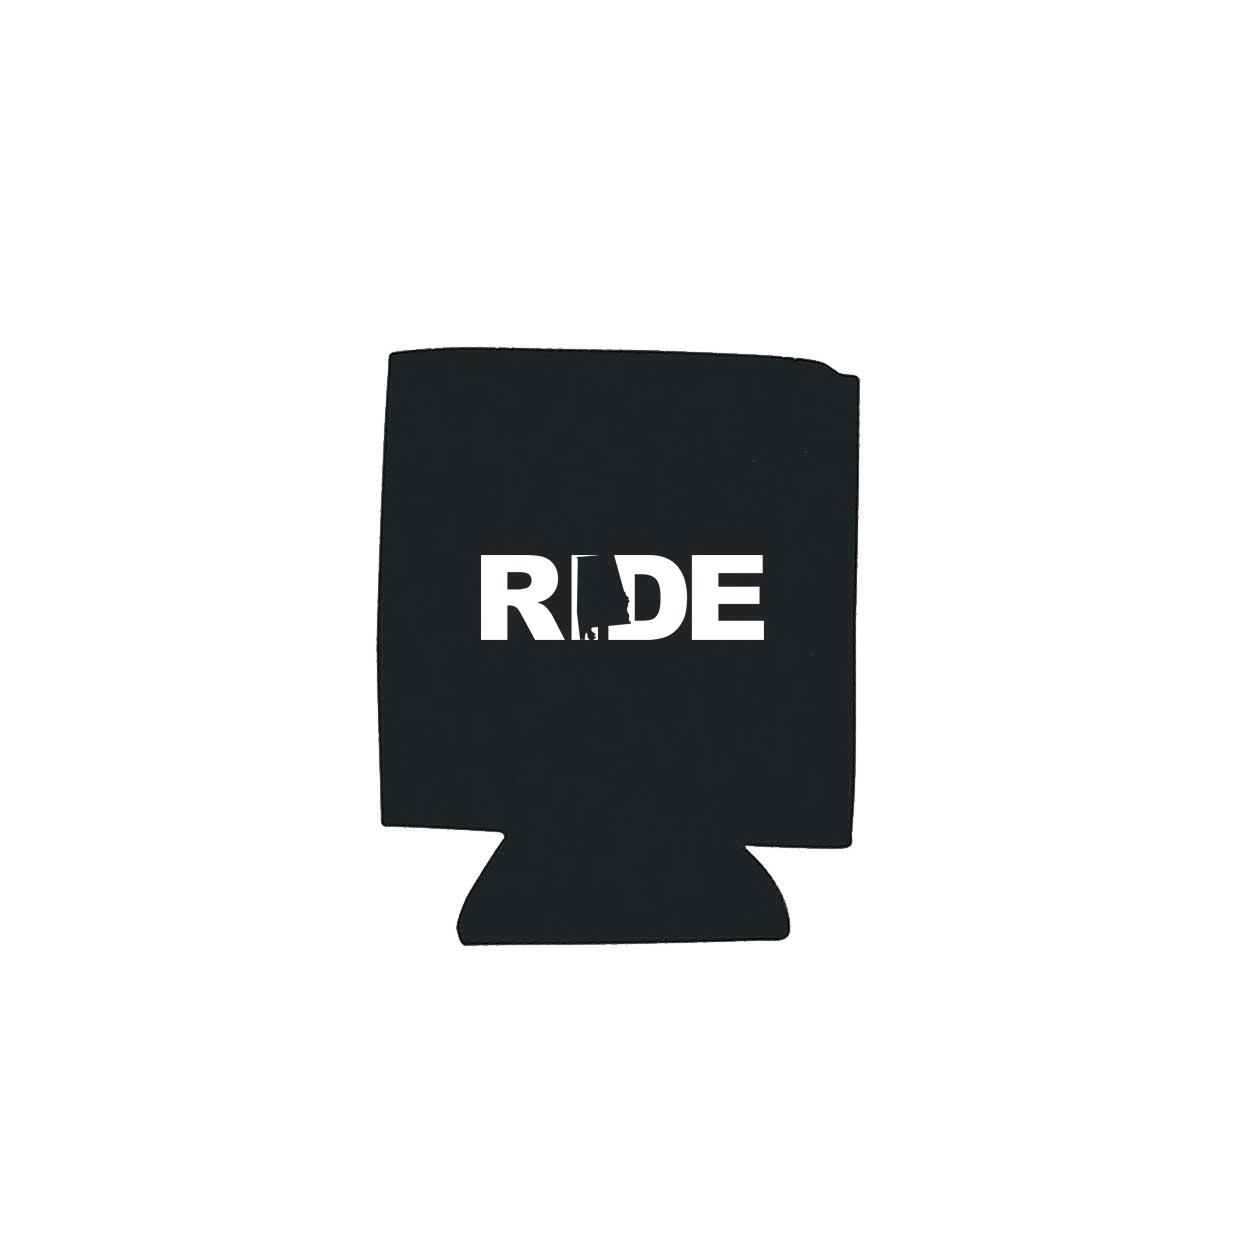 Ride California Koozie Black (White Logo)